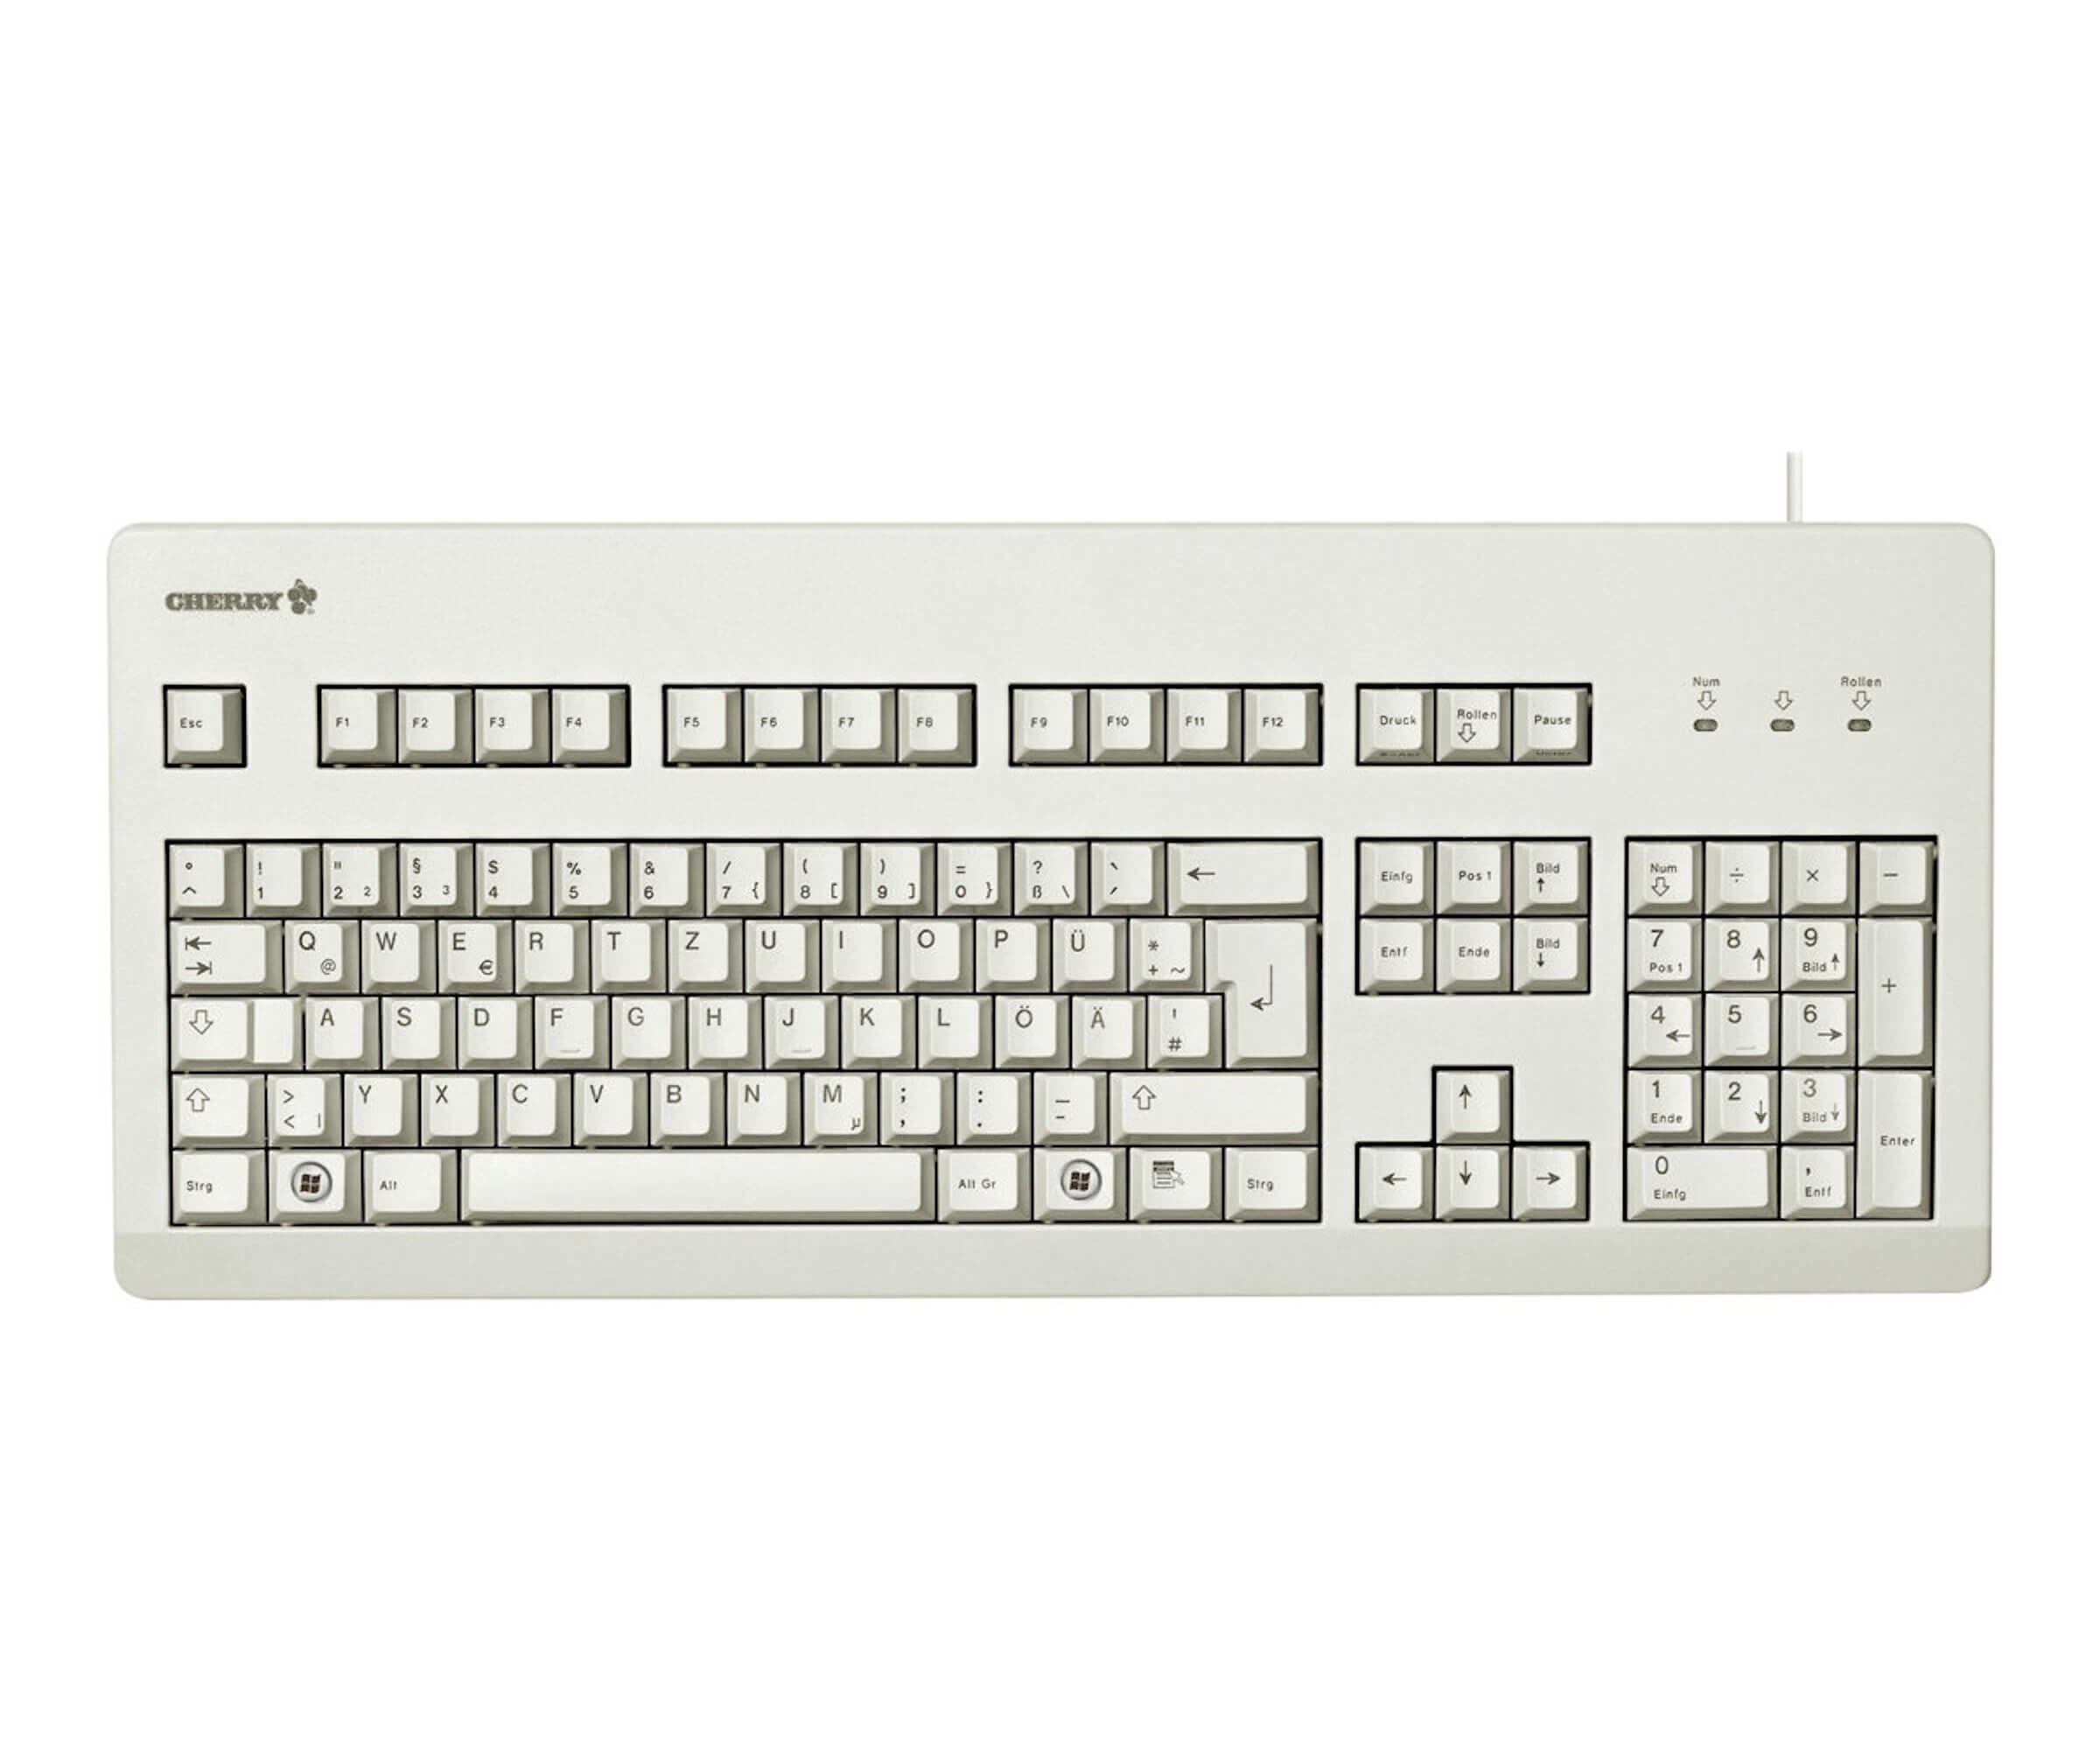 CHERRY Tastatur - Modell: Cherry Comfort Line G80-3000 Beige